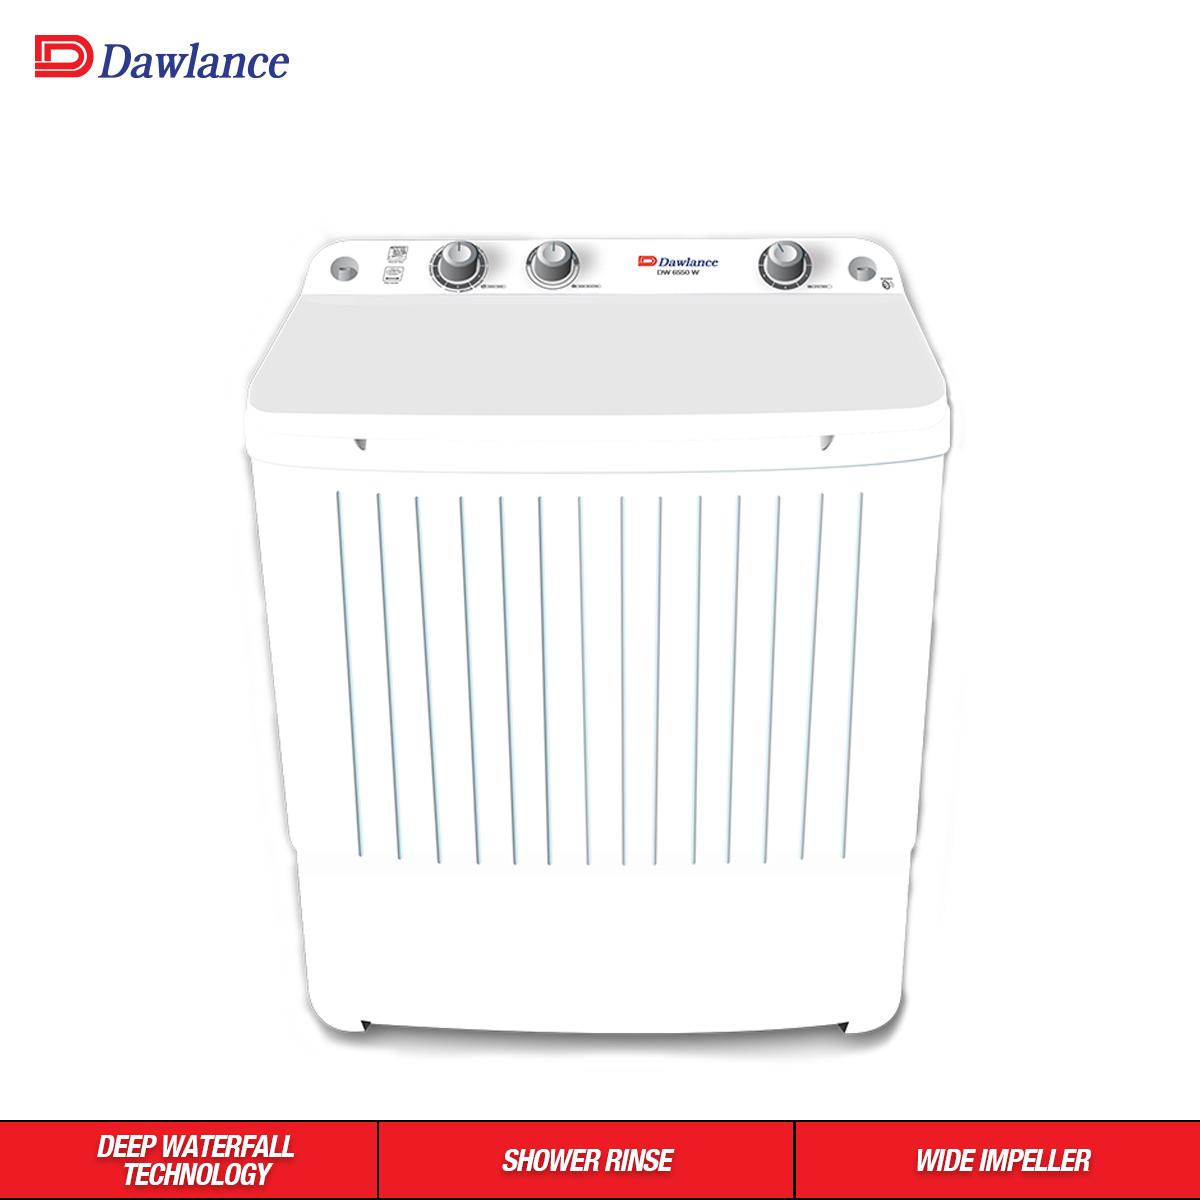 Dawlance 8 Kg Twin Tub Washing Machine Semi Automatic Dw 6550w White Color